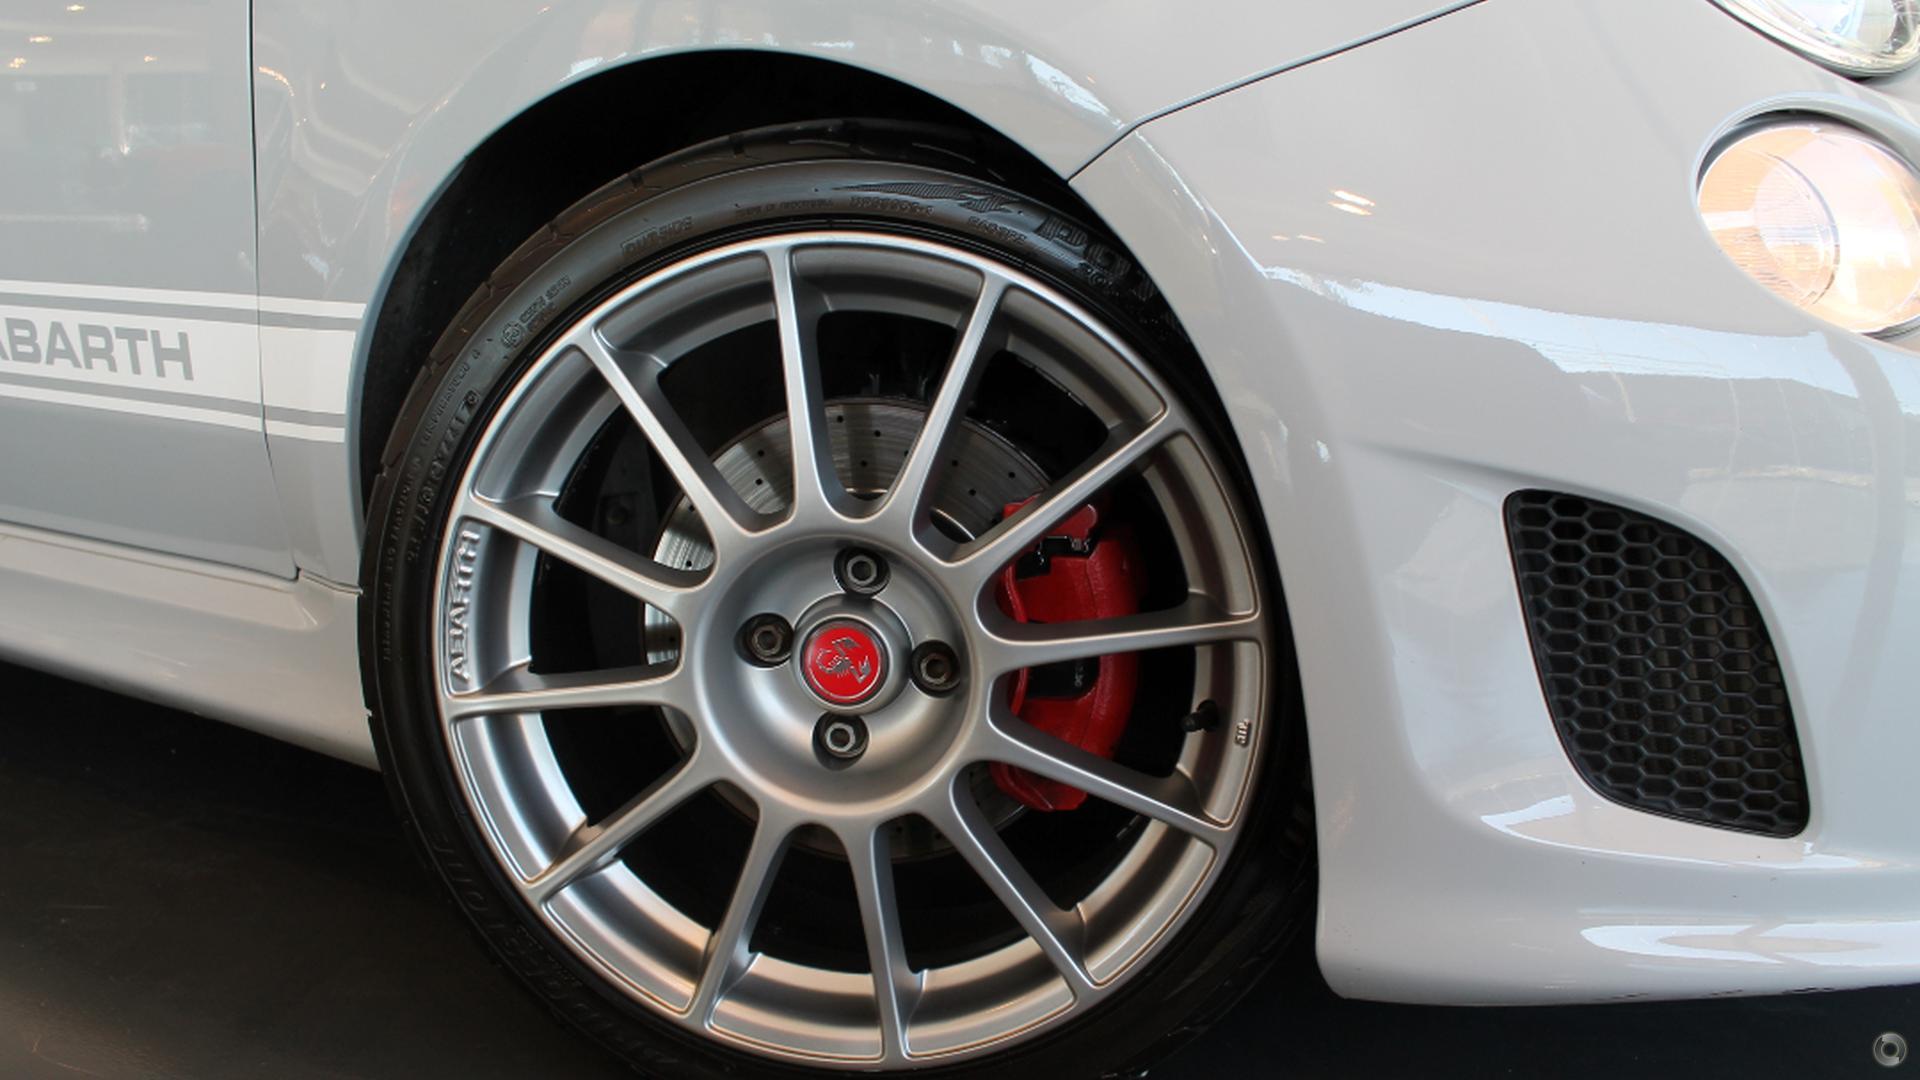 2012 Abarth 500 Esseesse C Series 1